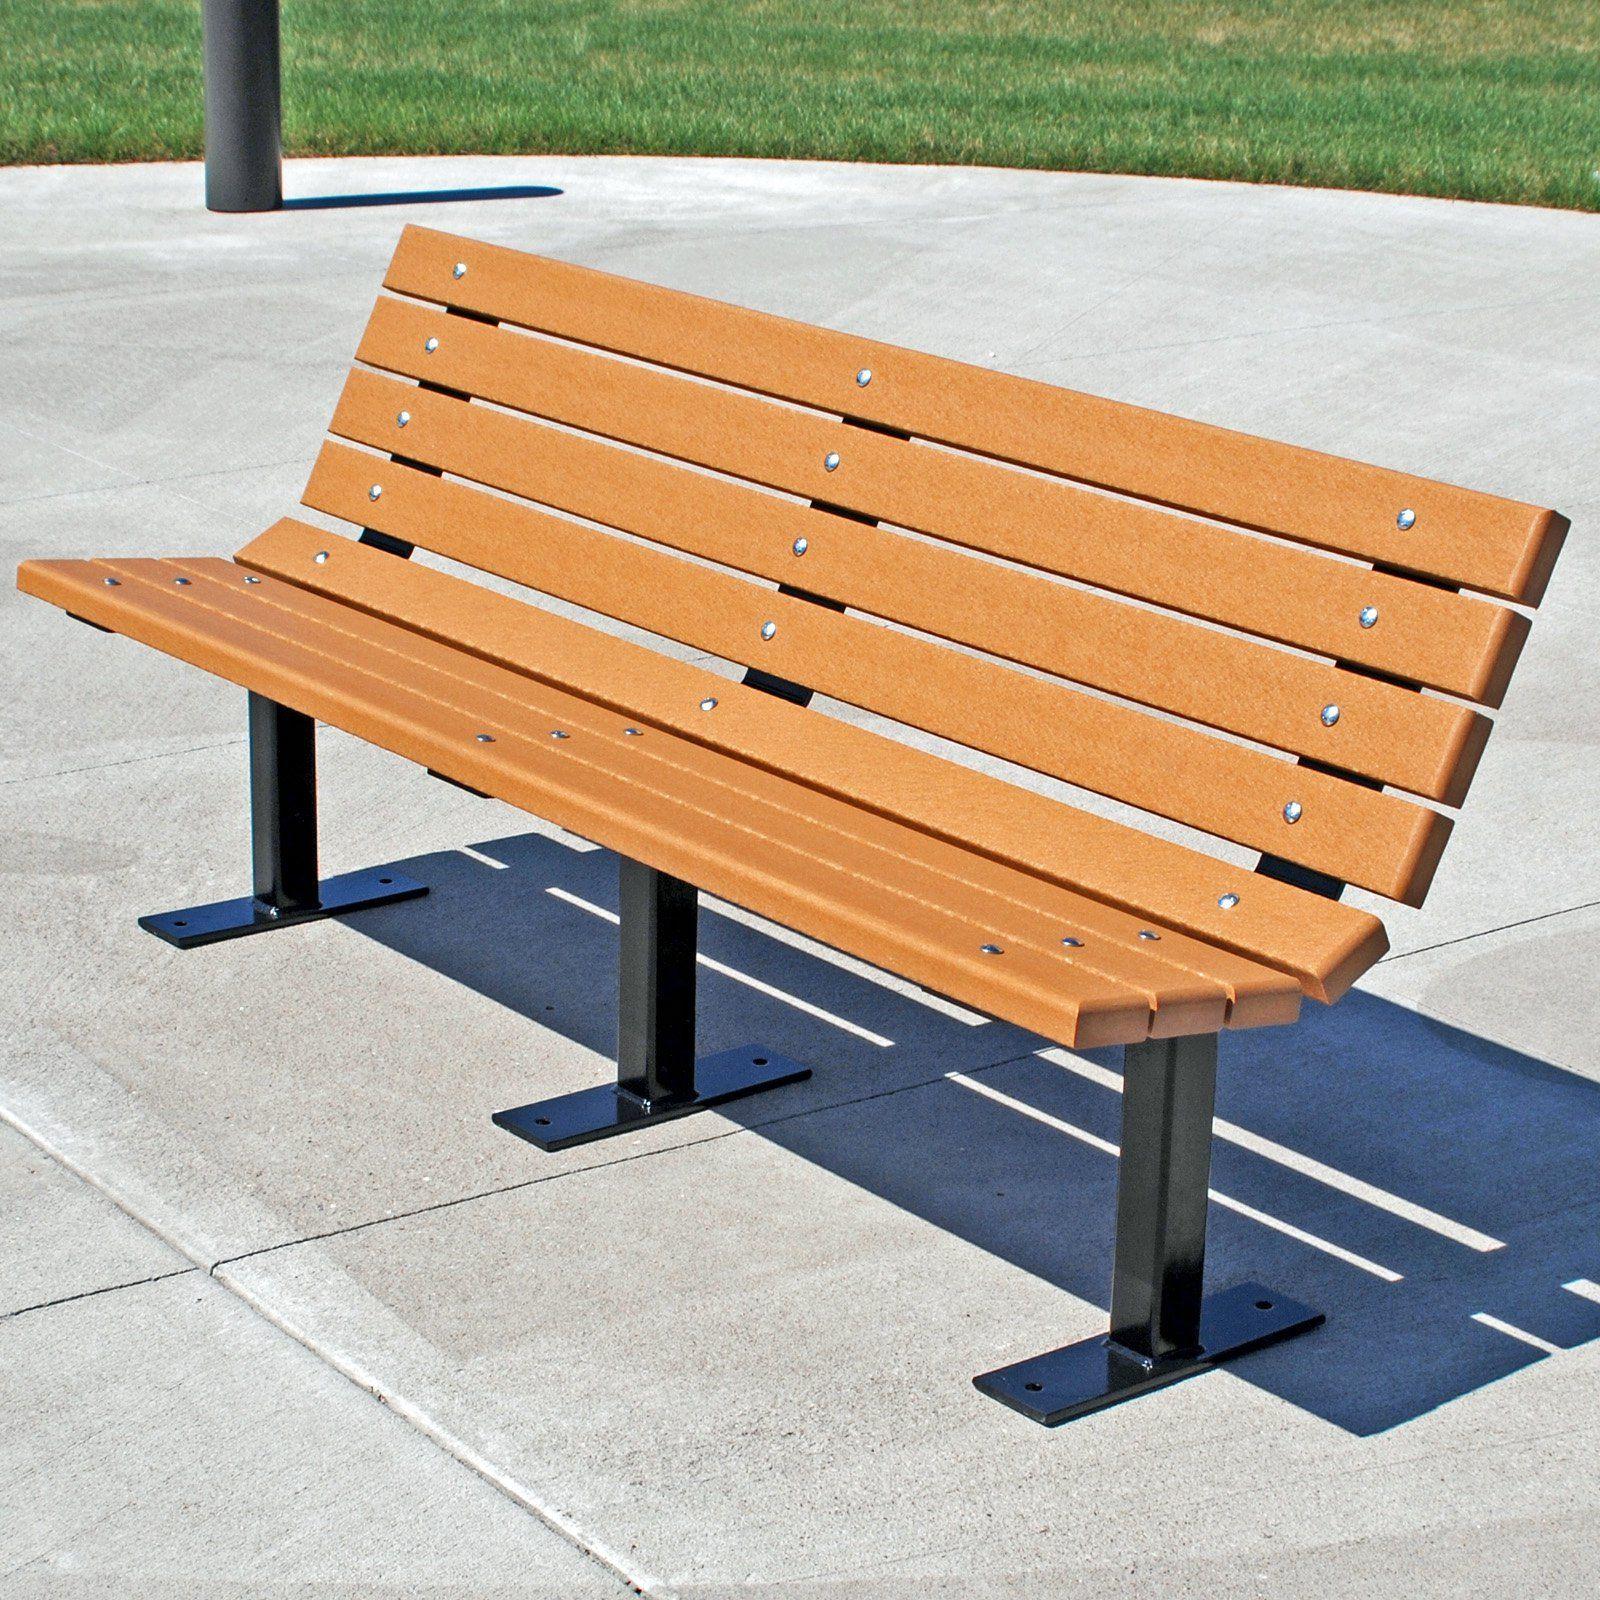 Surprising Jayhawk Plastics Contour Recycled Plastic Commercial Park Evergreenethics Interior Chair Design Evergreenethicsorg